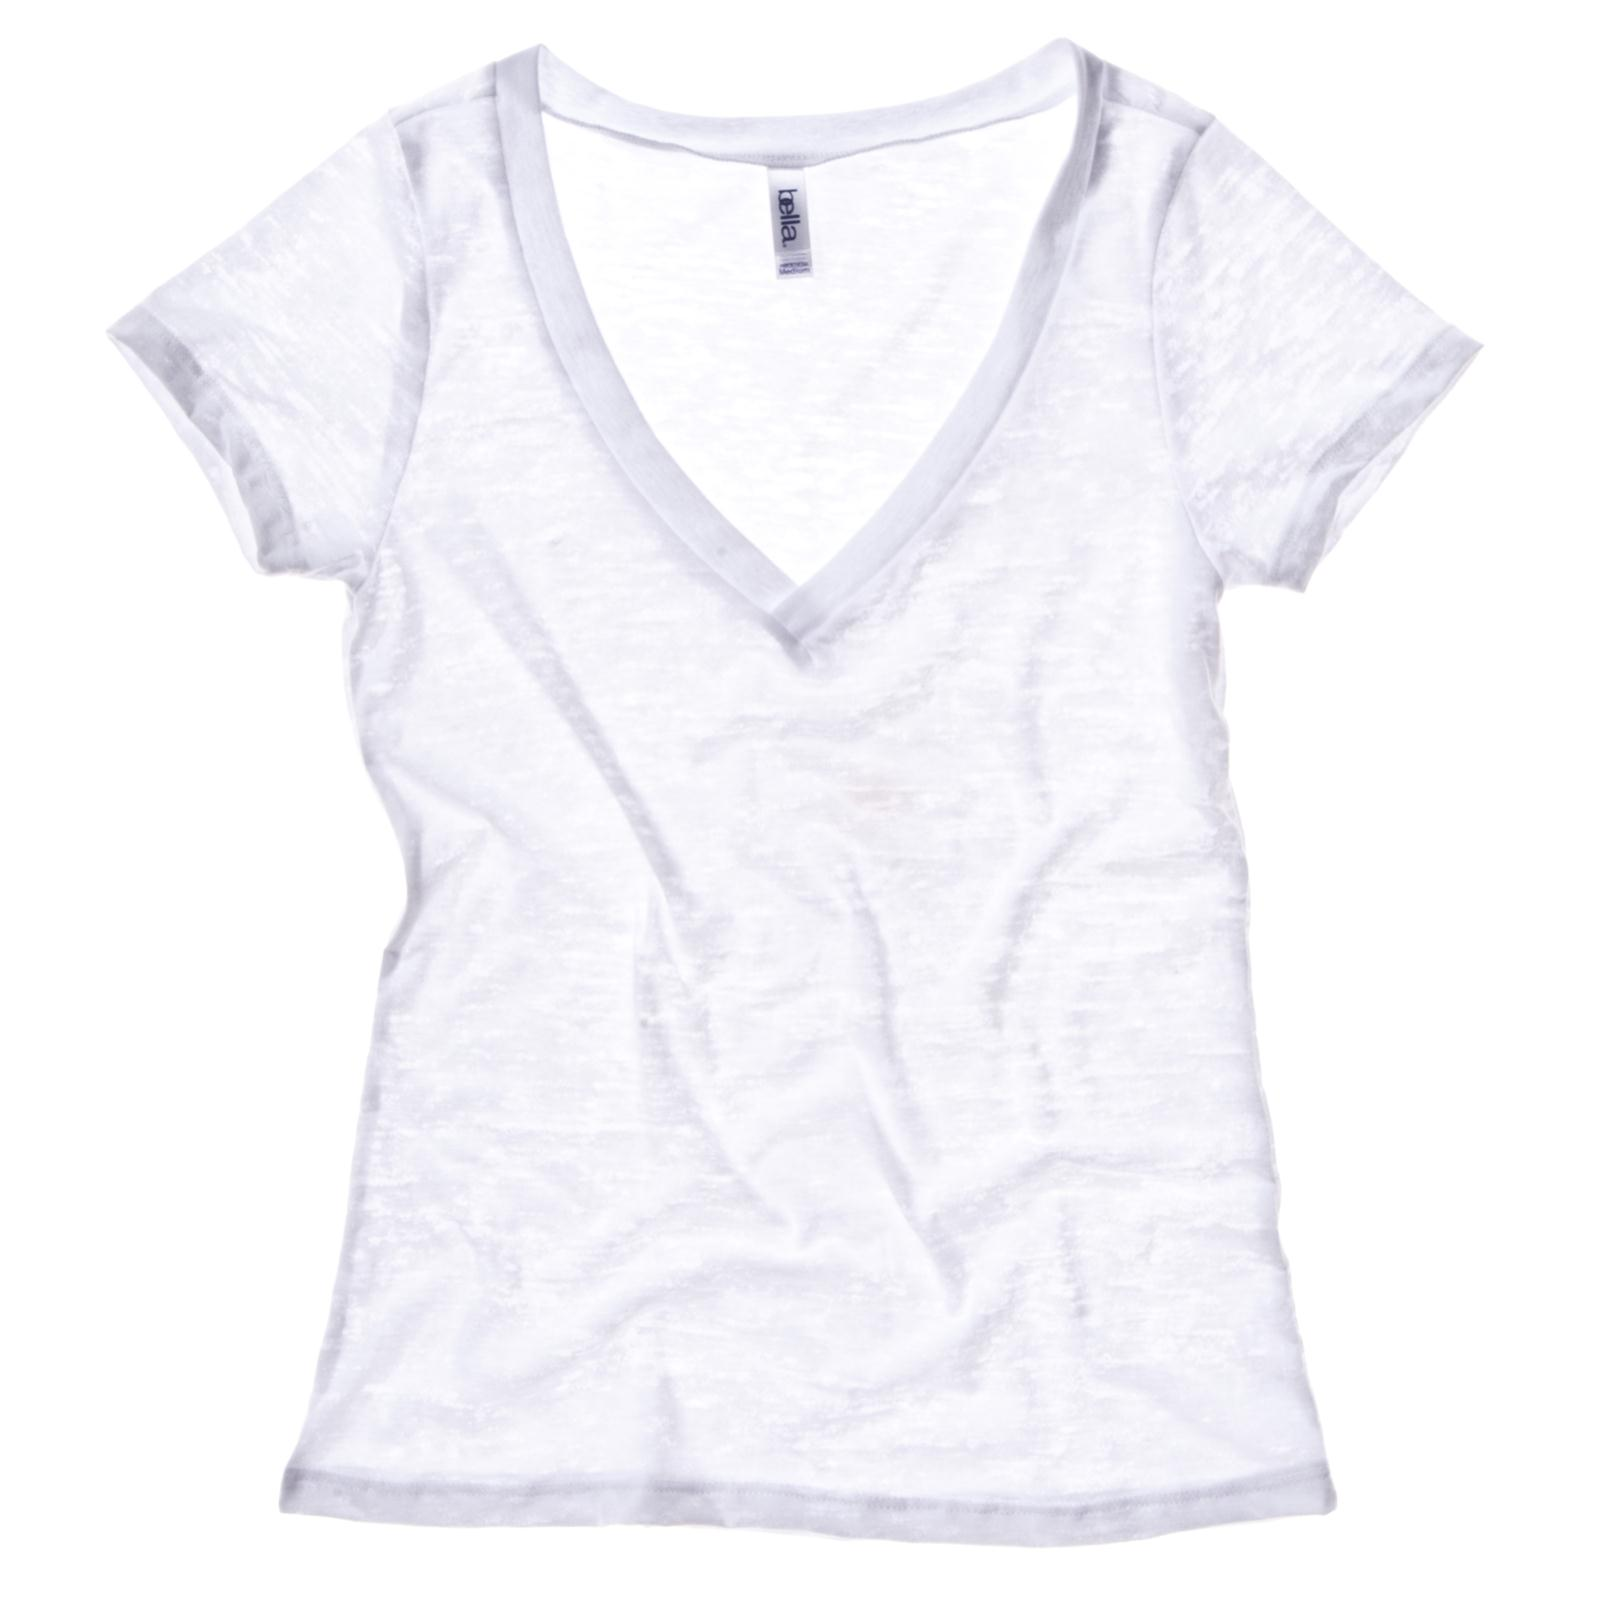 New bella canvas womens ladies sheer burnout v neck t for Best v neck t shirts women s